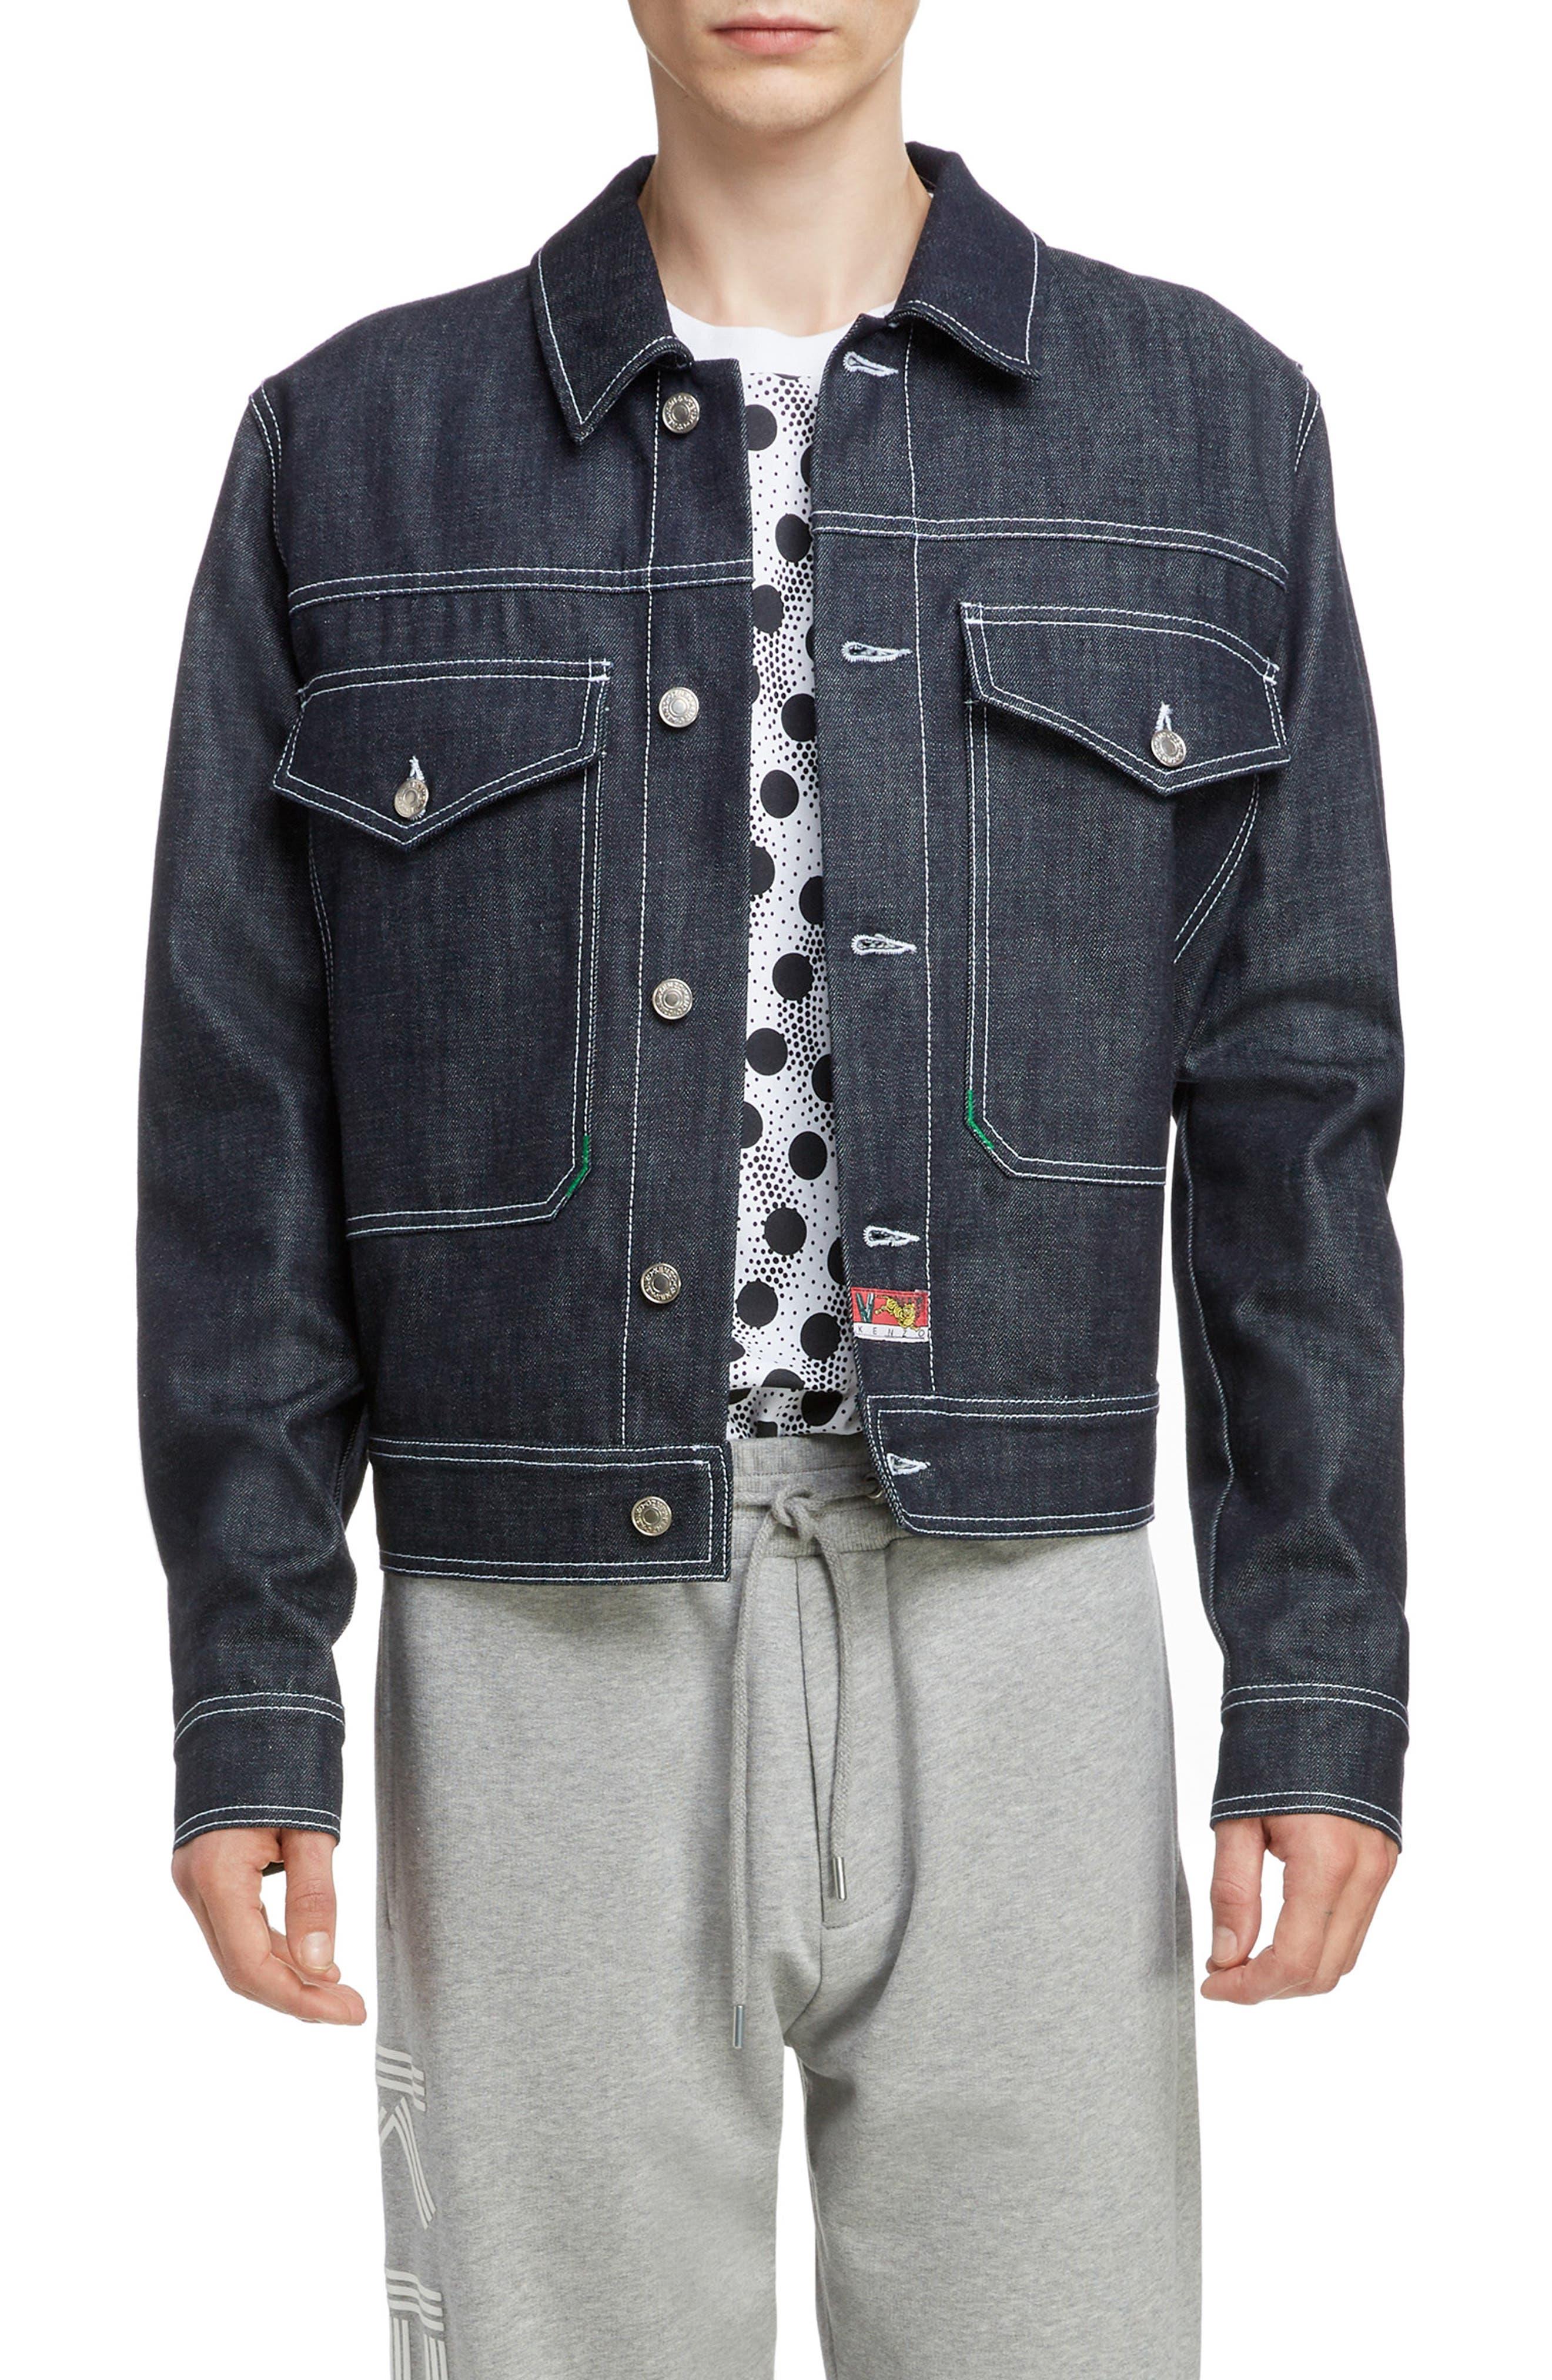 KENZO, Jumping Tiger Embroidered Denim Jacket, Main thumbnail 1, color, NAVY BLUE